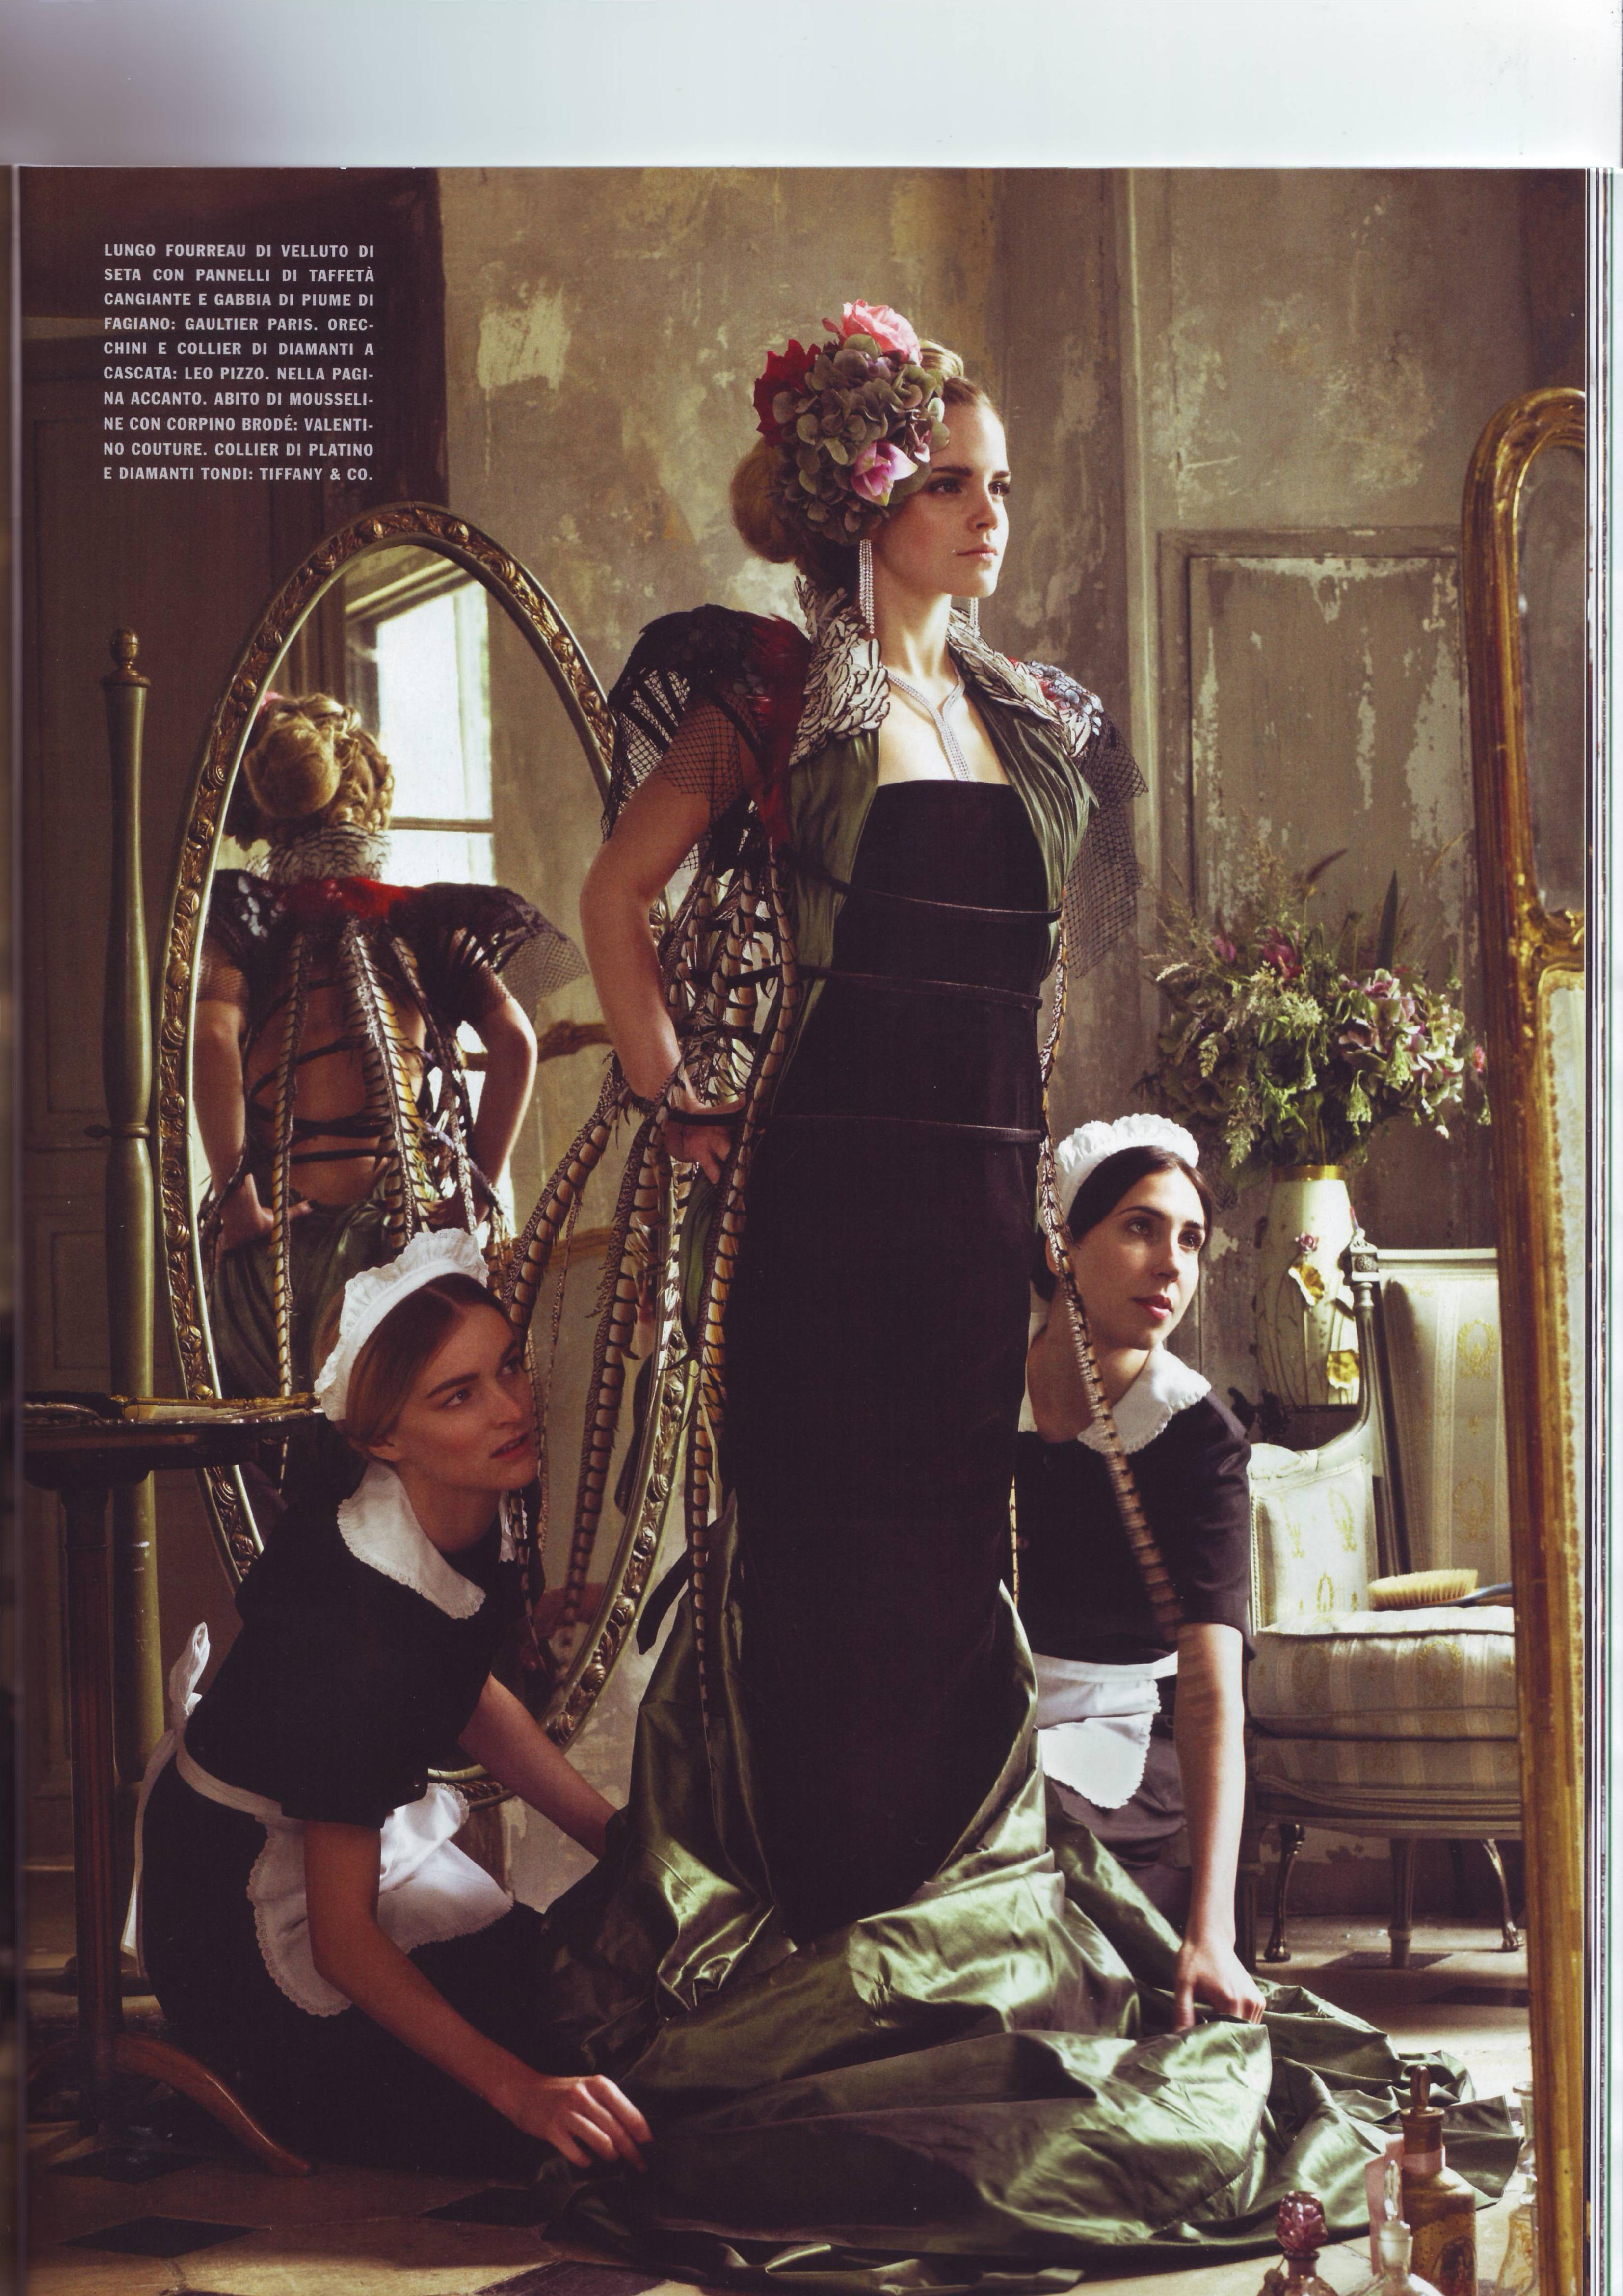 67271_Emma_Watson_-_Vogue_Italia_September_2008_068_122_853lo.jpg